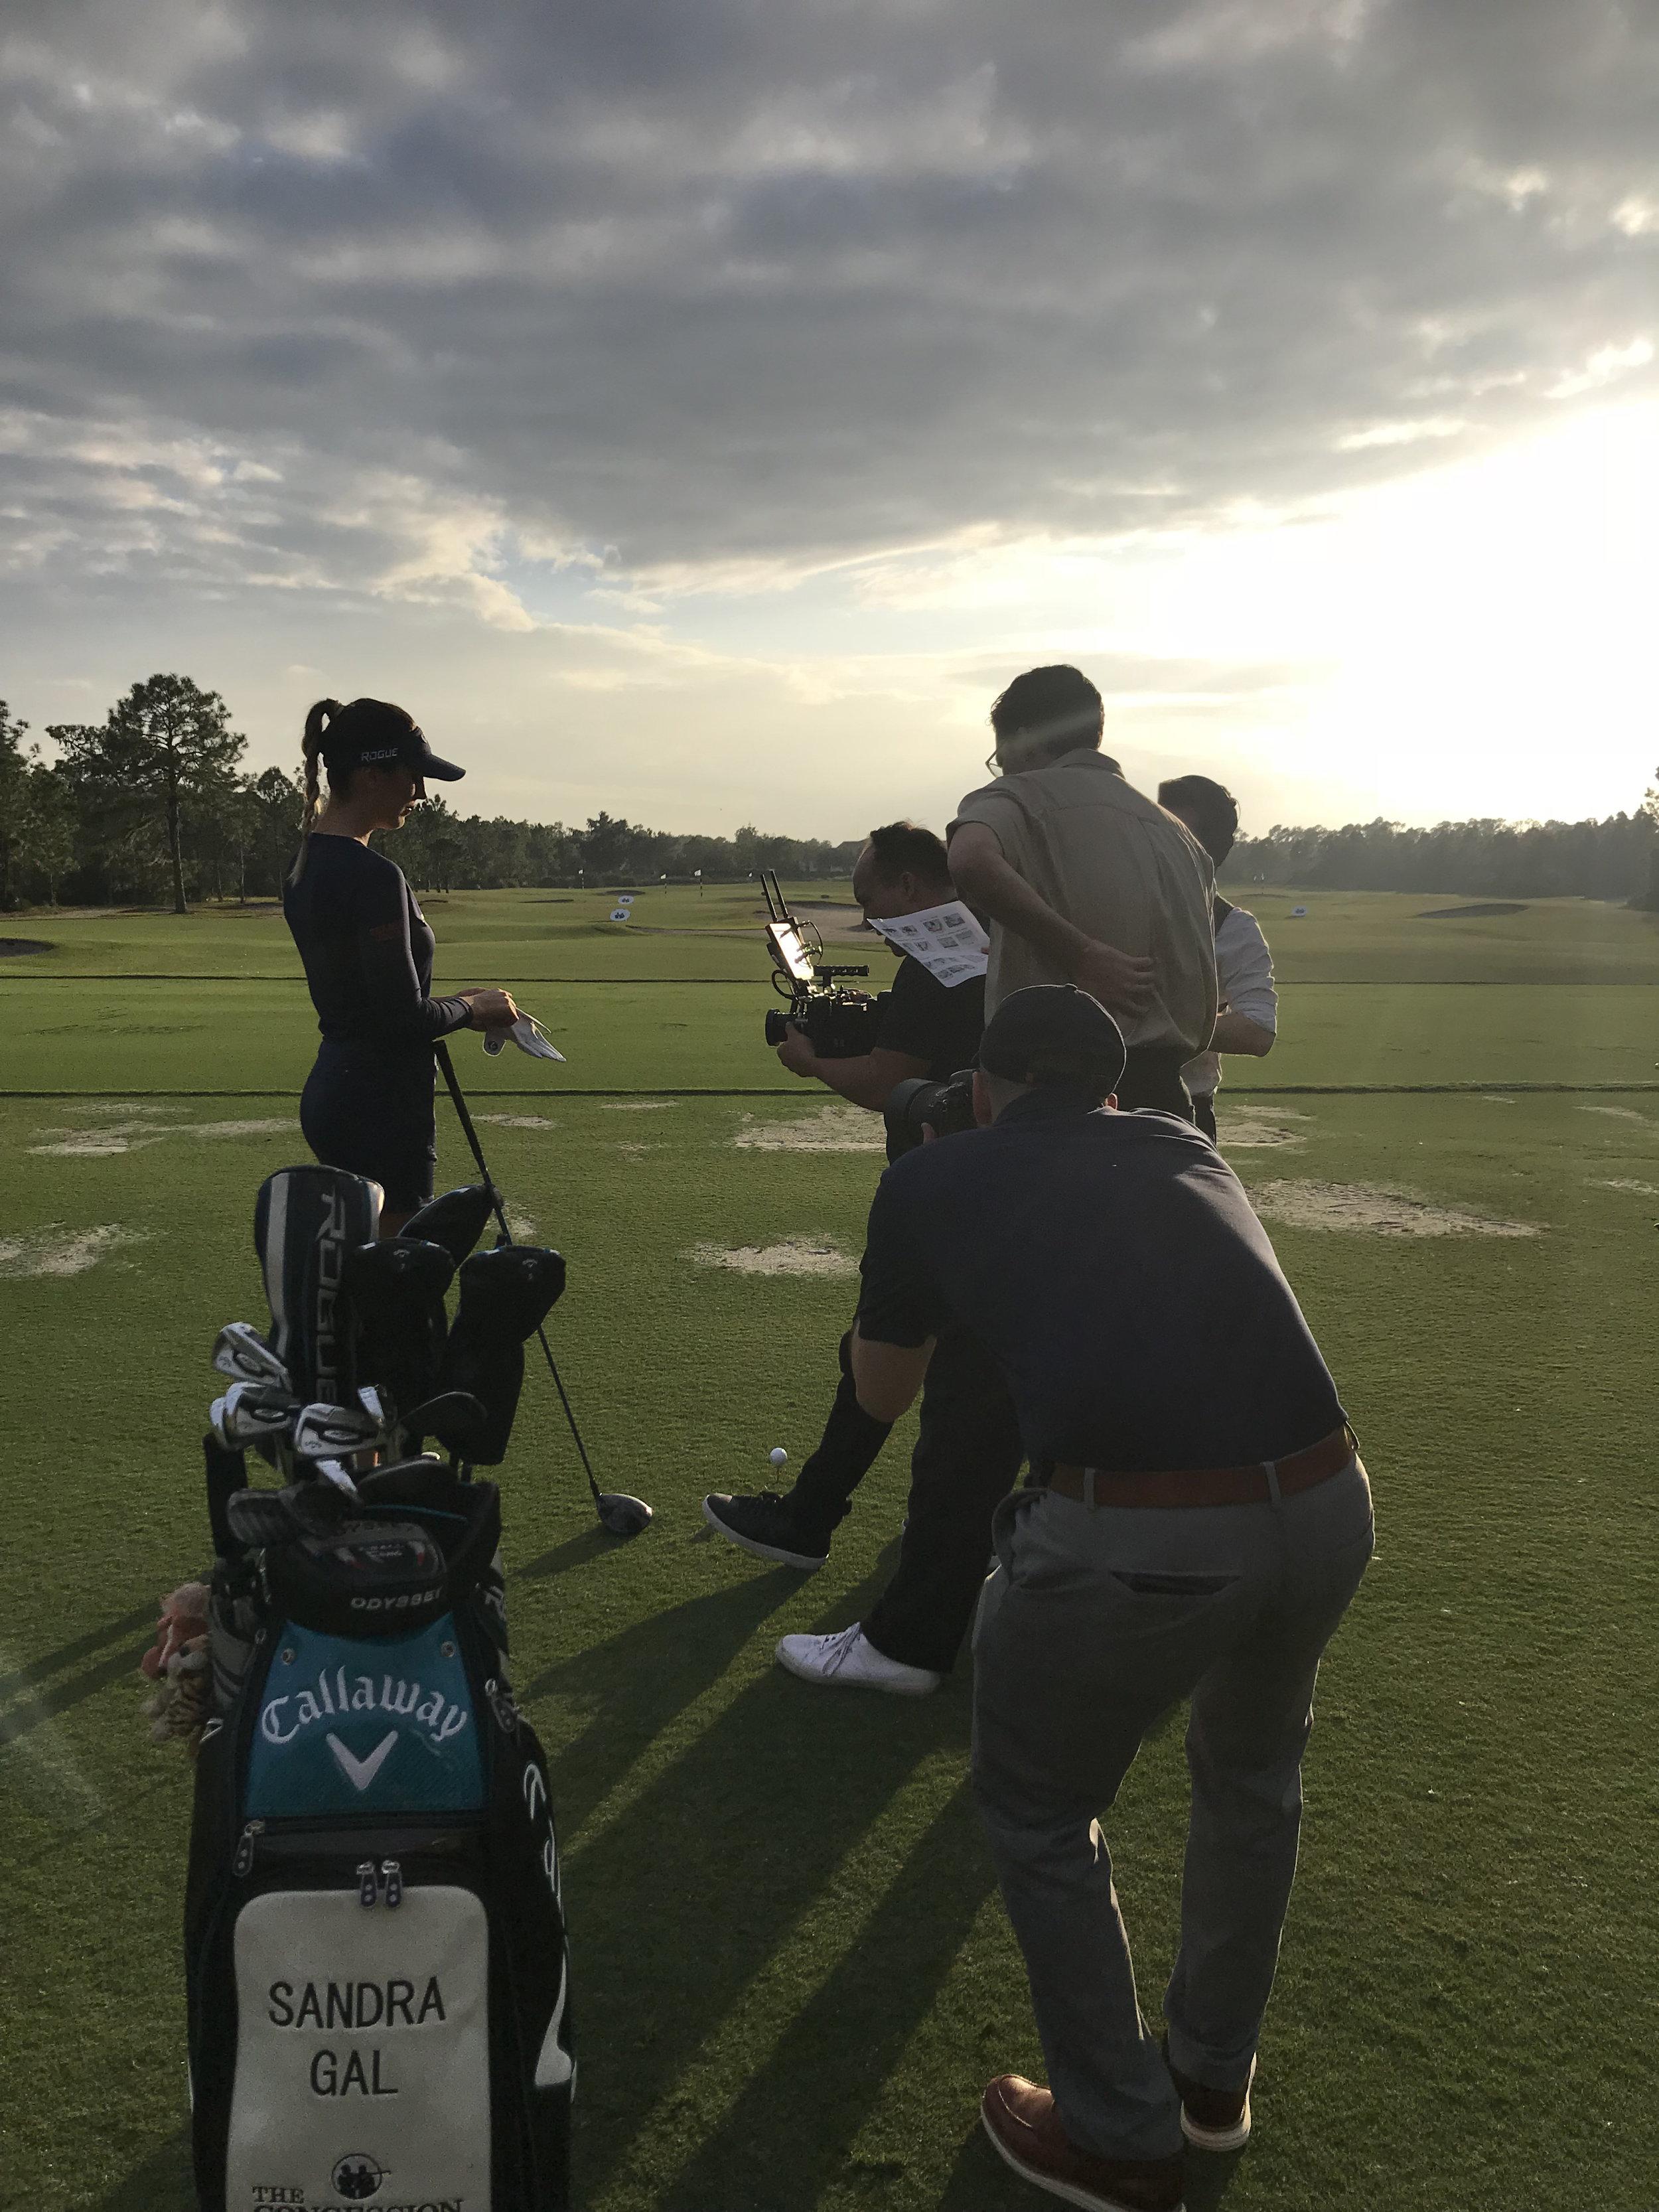 Nick Pecori Tampa Orlando Advertising Commercial Photographer for Acer LPGA Golfer Sandra Gal - 1.JPG